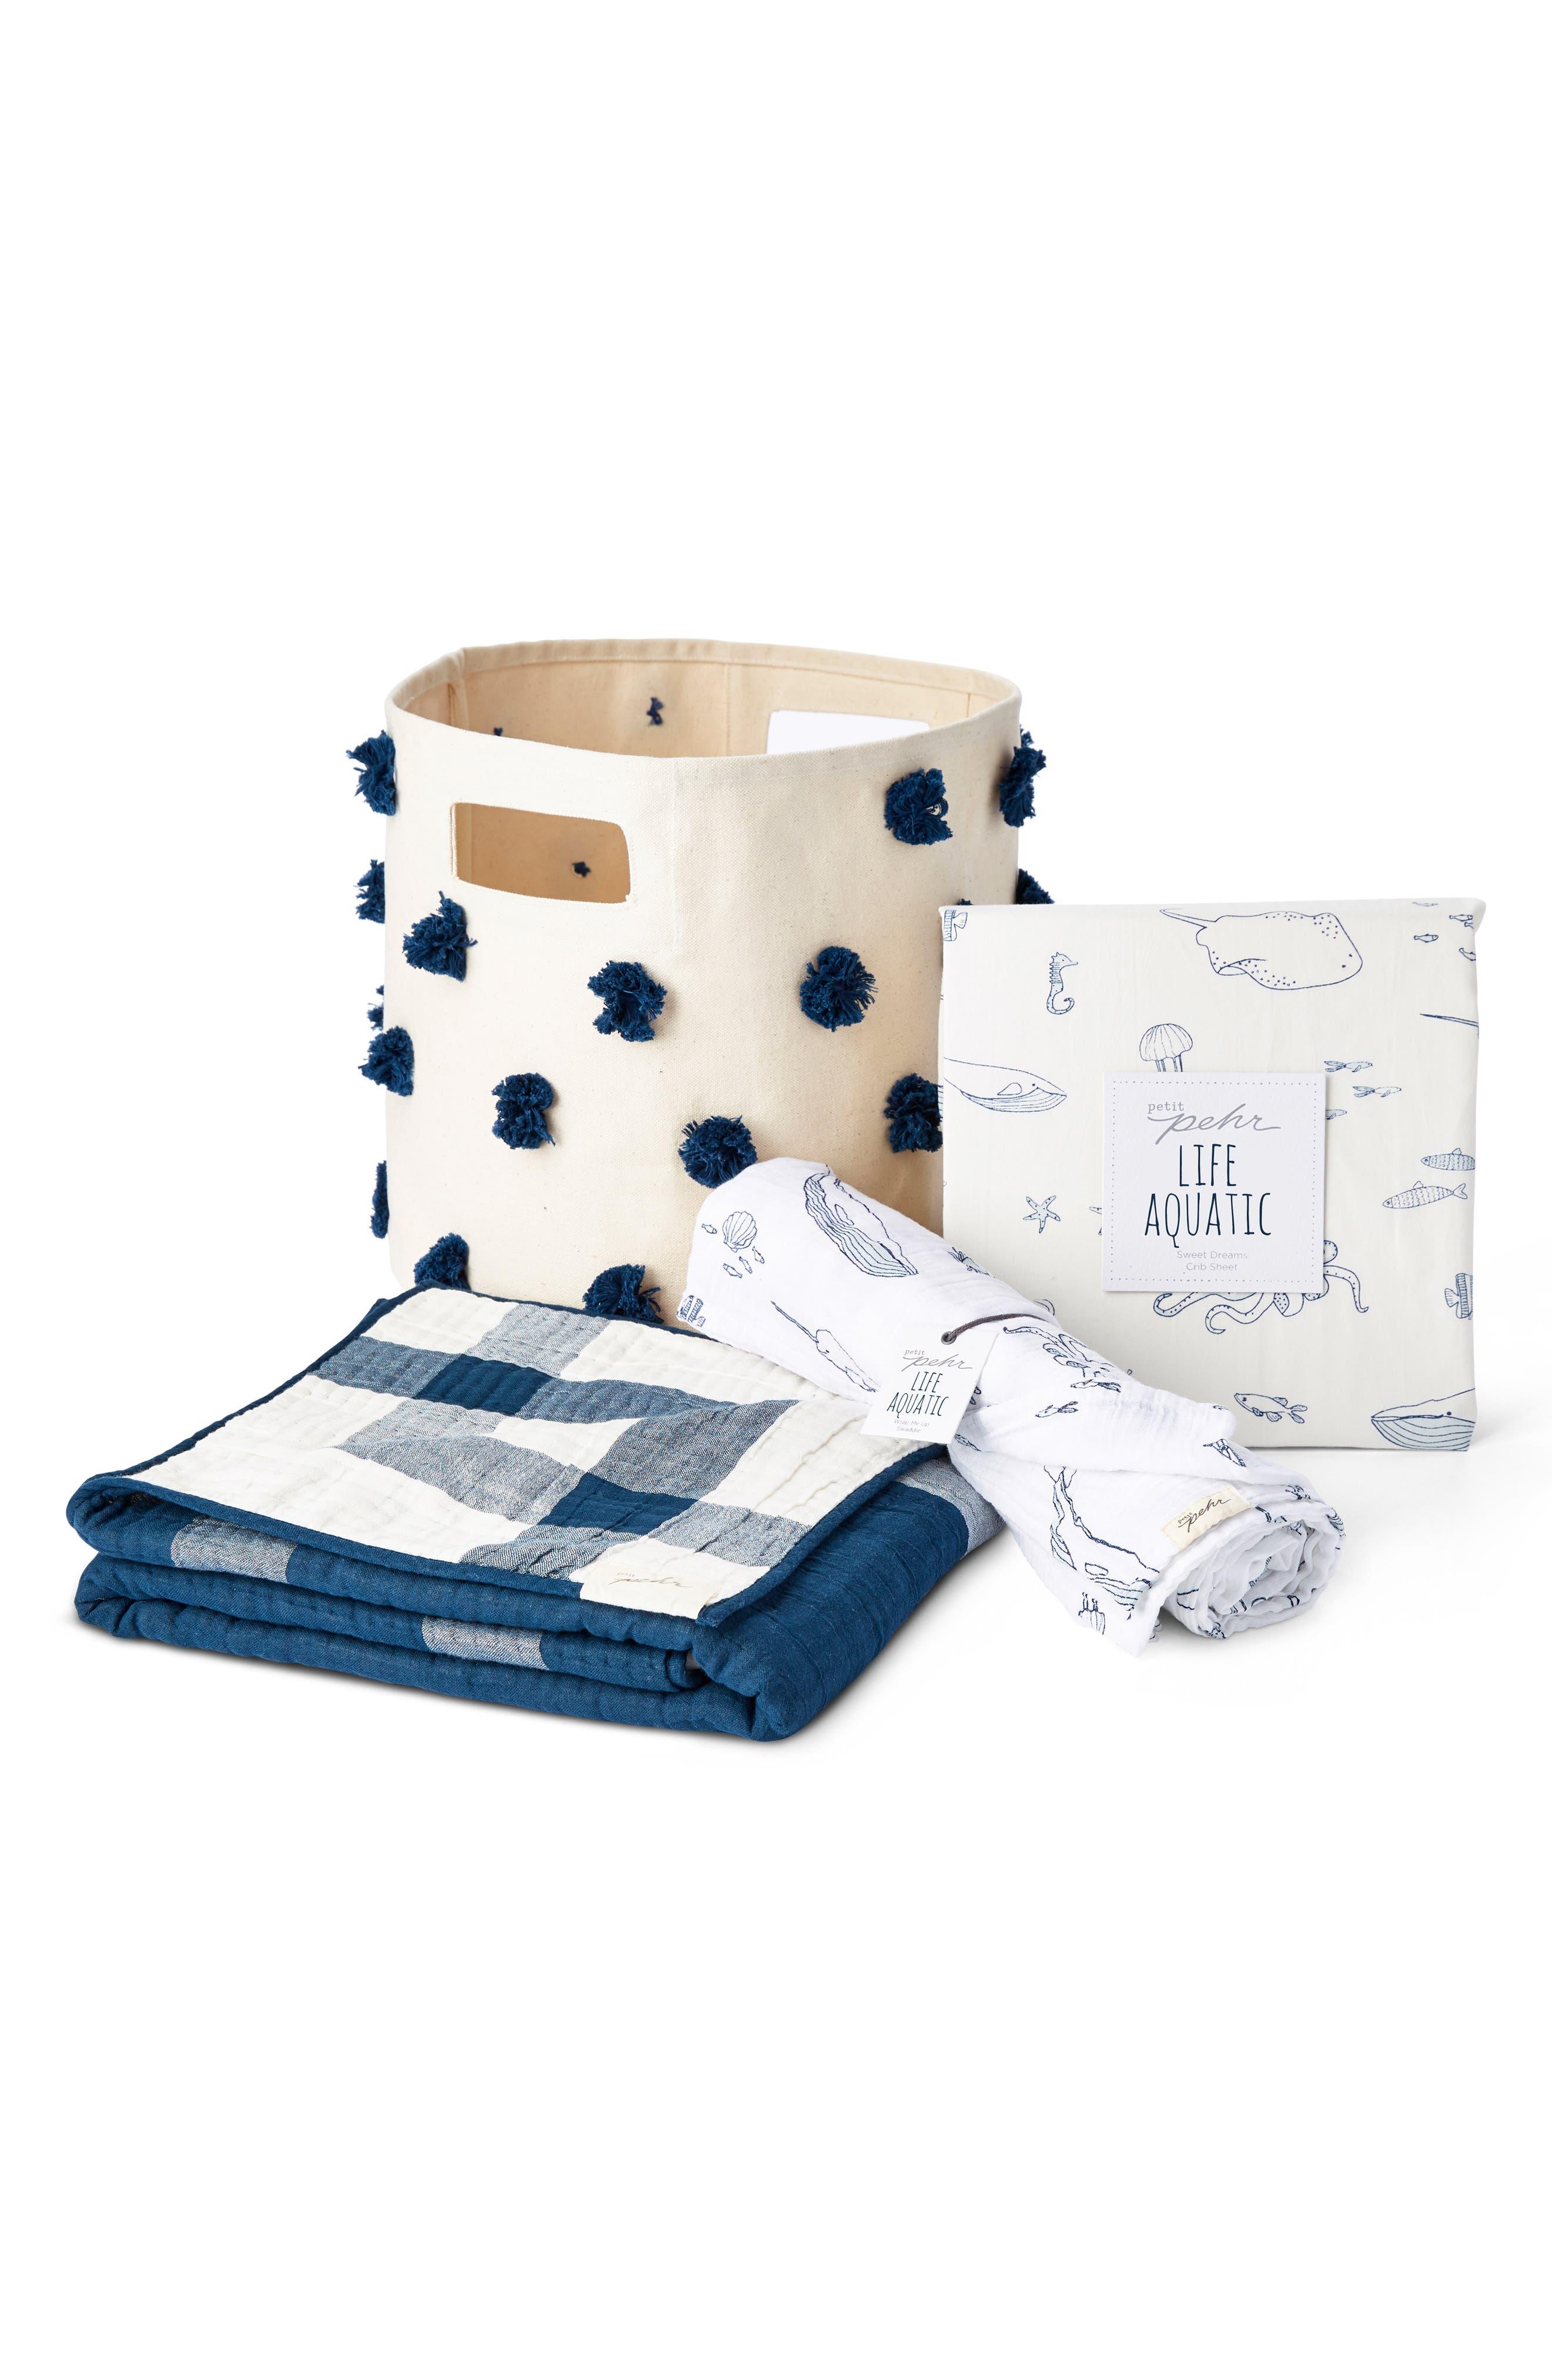 Life Aquatic 4-Piece Bed Linen & Storage Set,                             Main thumbnail 1, color,                             BLUE